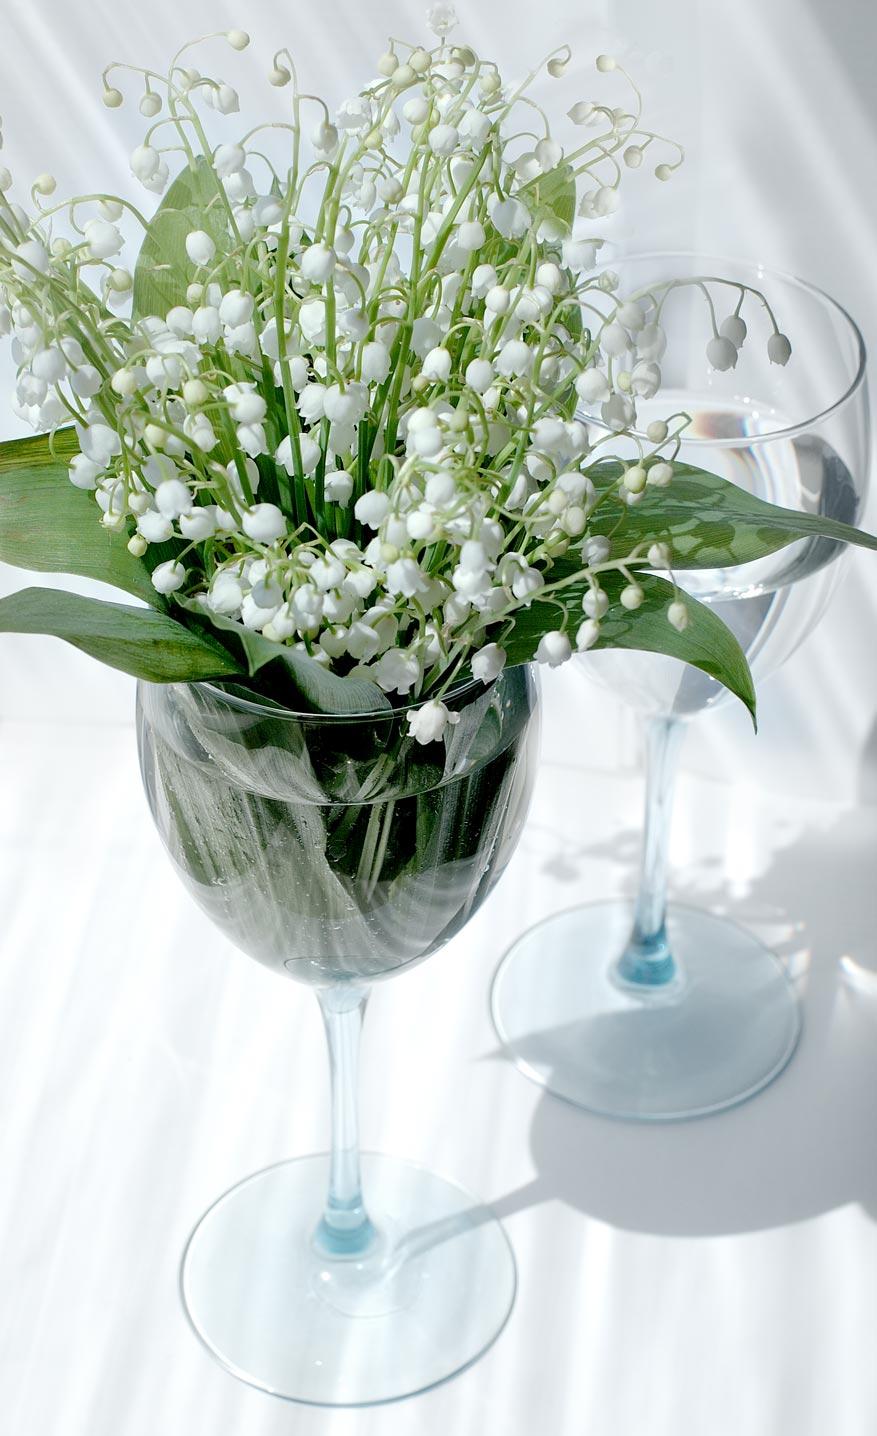 Using glasses as vases flower pressflower press displaying flowers in glasses reviewsmspy